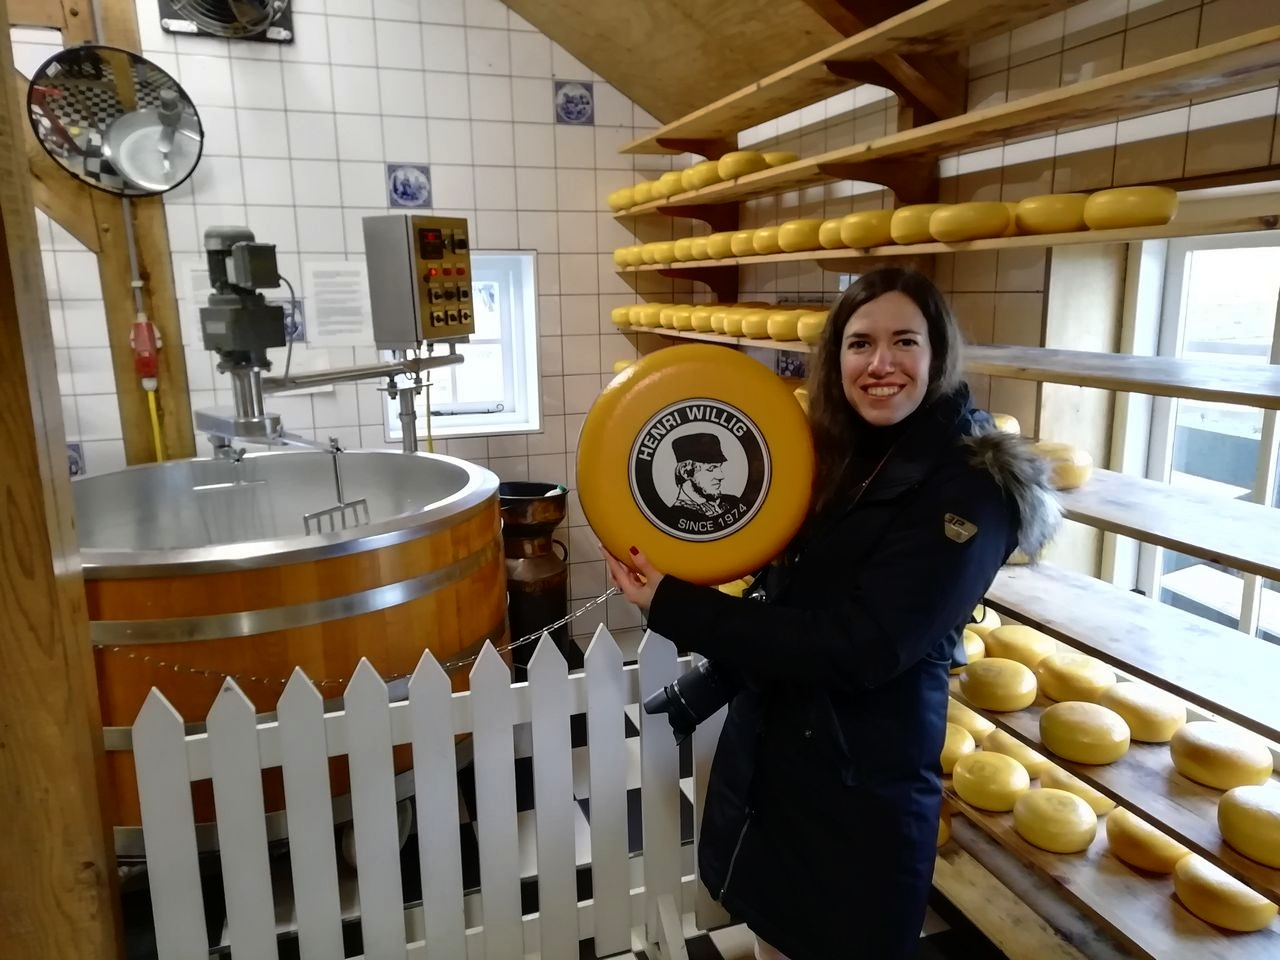 No te vayas sin probar el famoso queso de Henri Willig. ¡Espectacular!